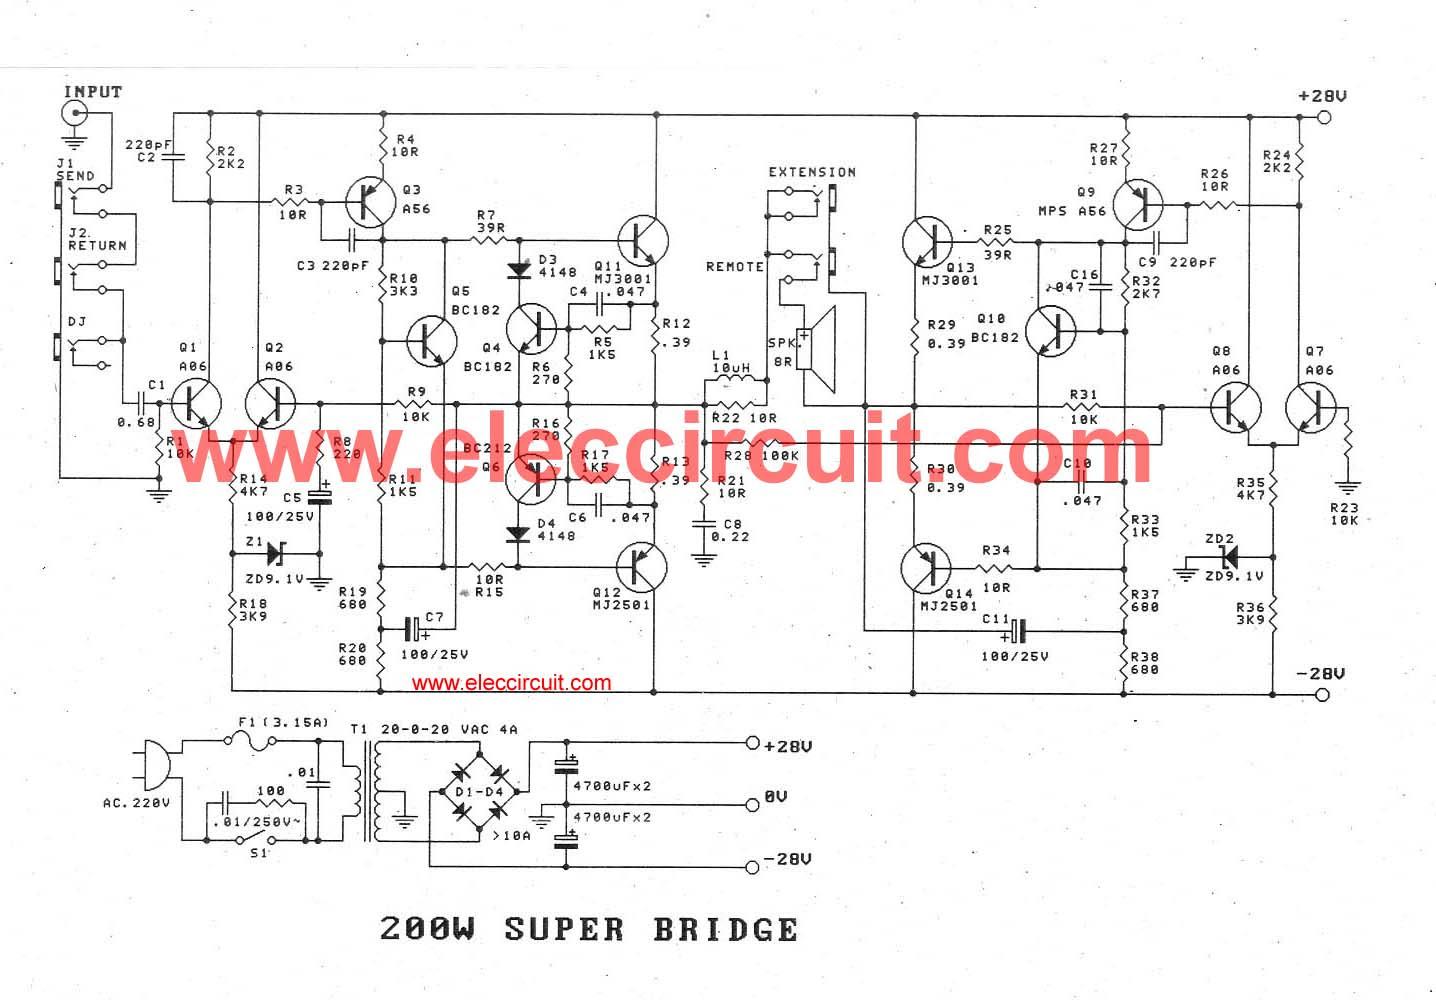 5200 1943 Mosfet 200 200 Watt Ample Ckt Pcb Layout